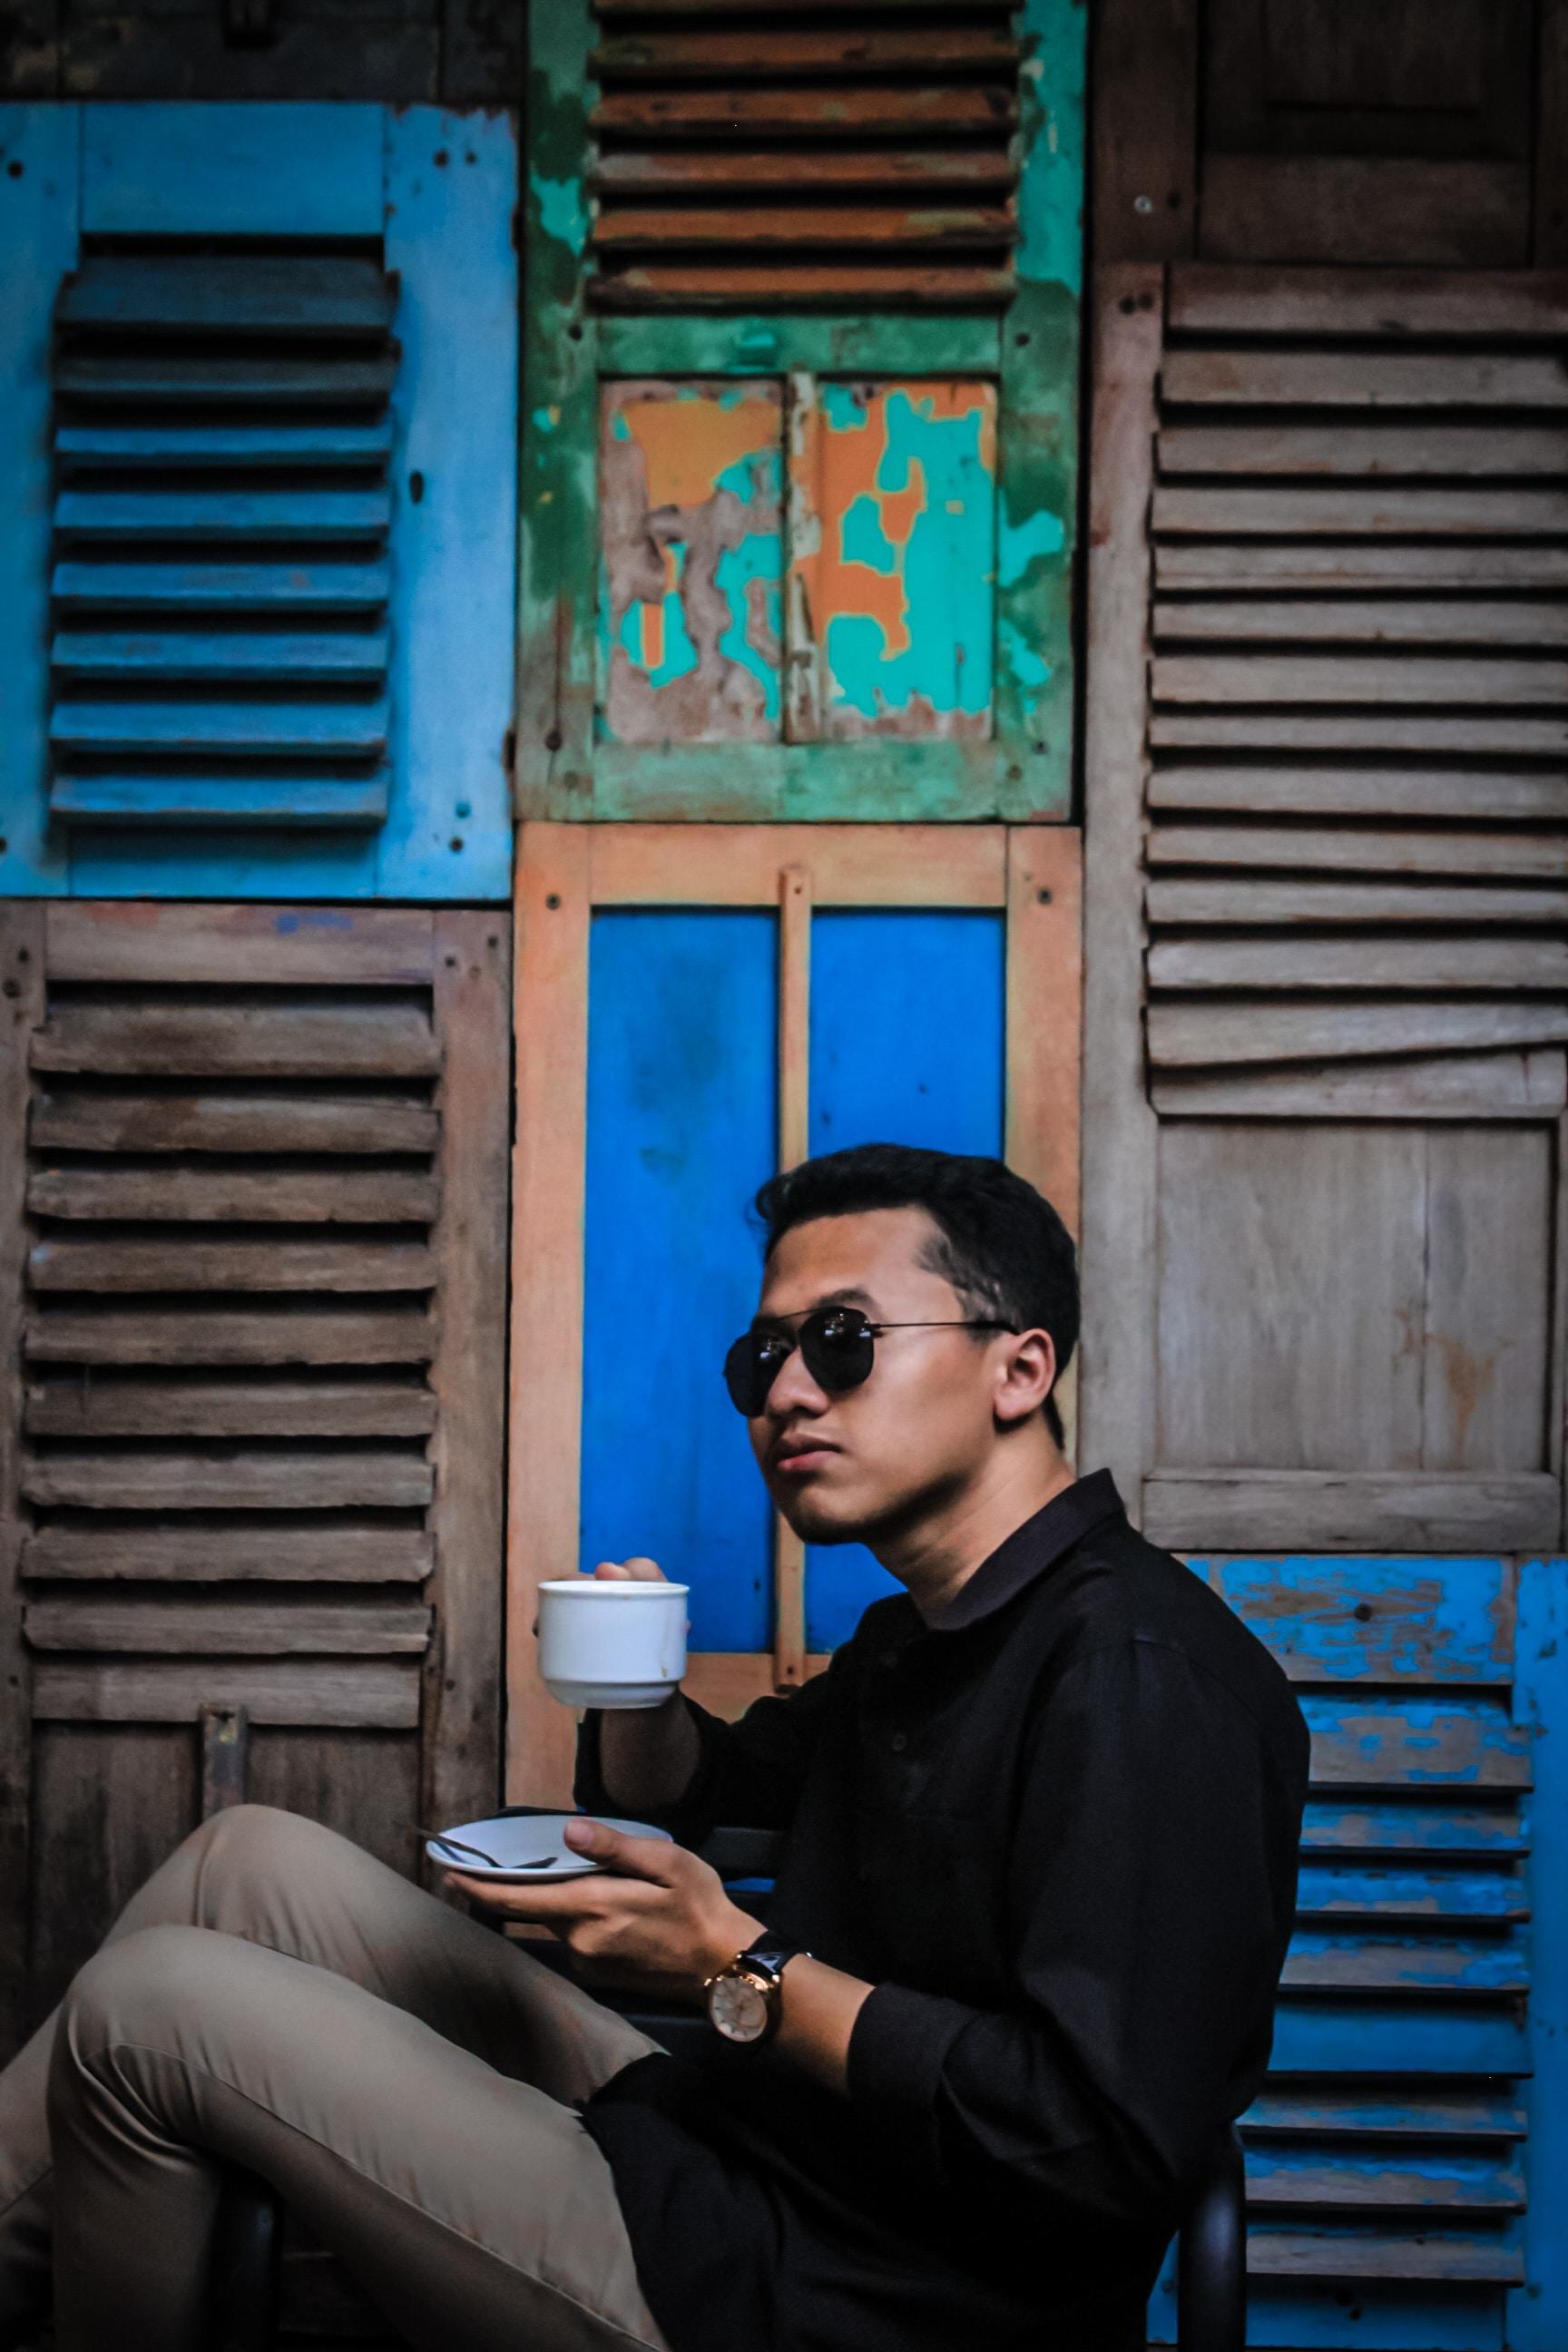 man in black dress shirt holding saucer and mug